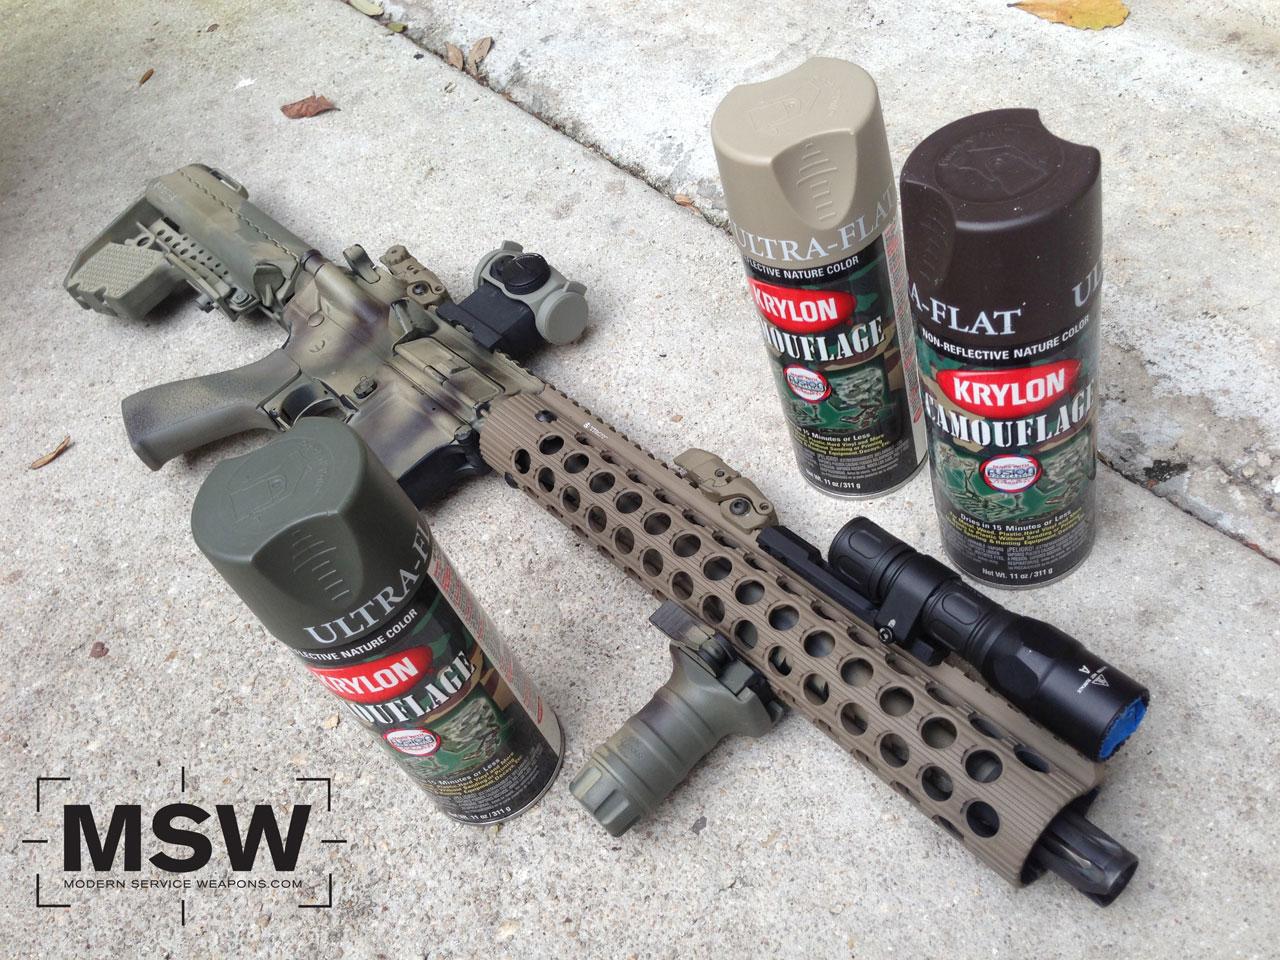 pin spray paint camo rifle on pinterest. Black Bedroom Furniture Sets. Home Design Ideas